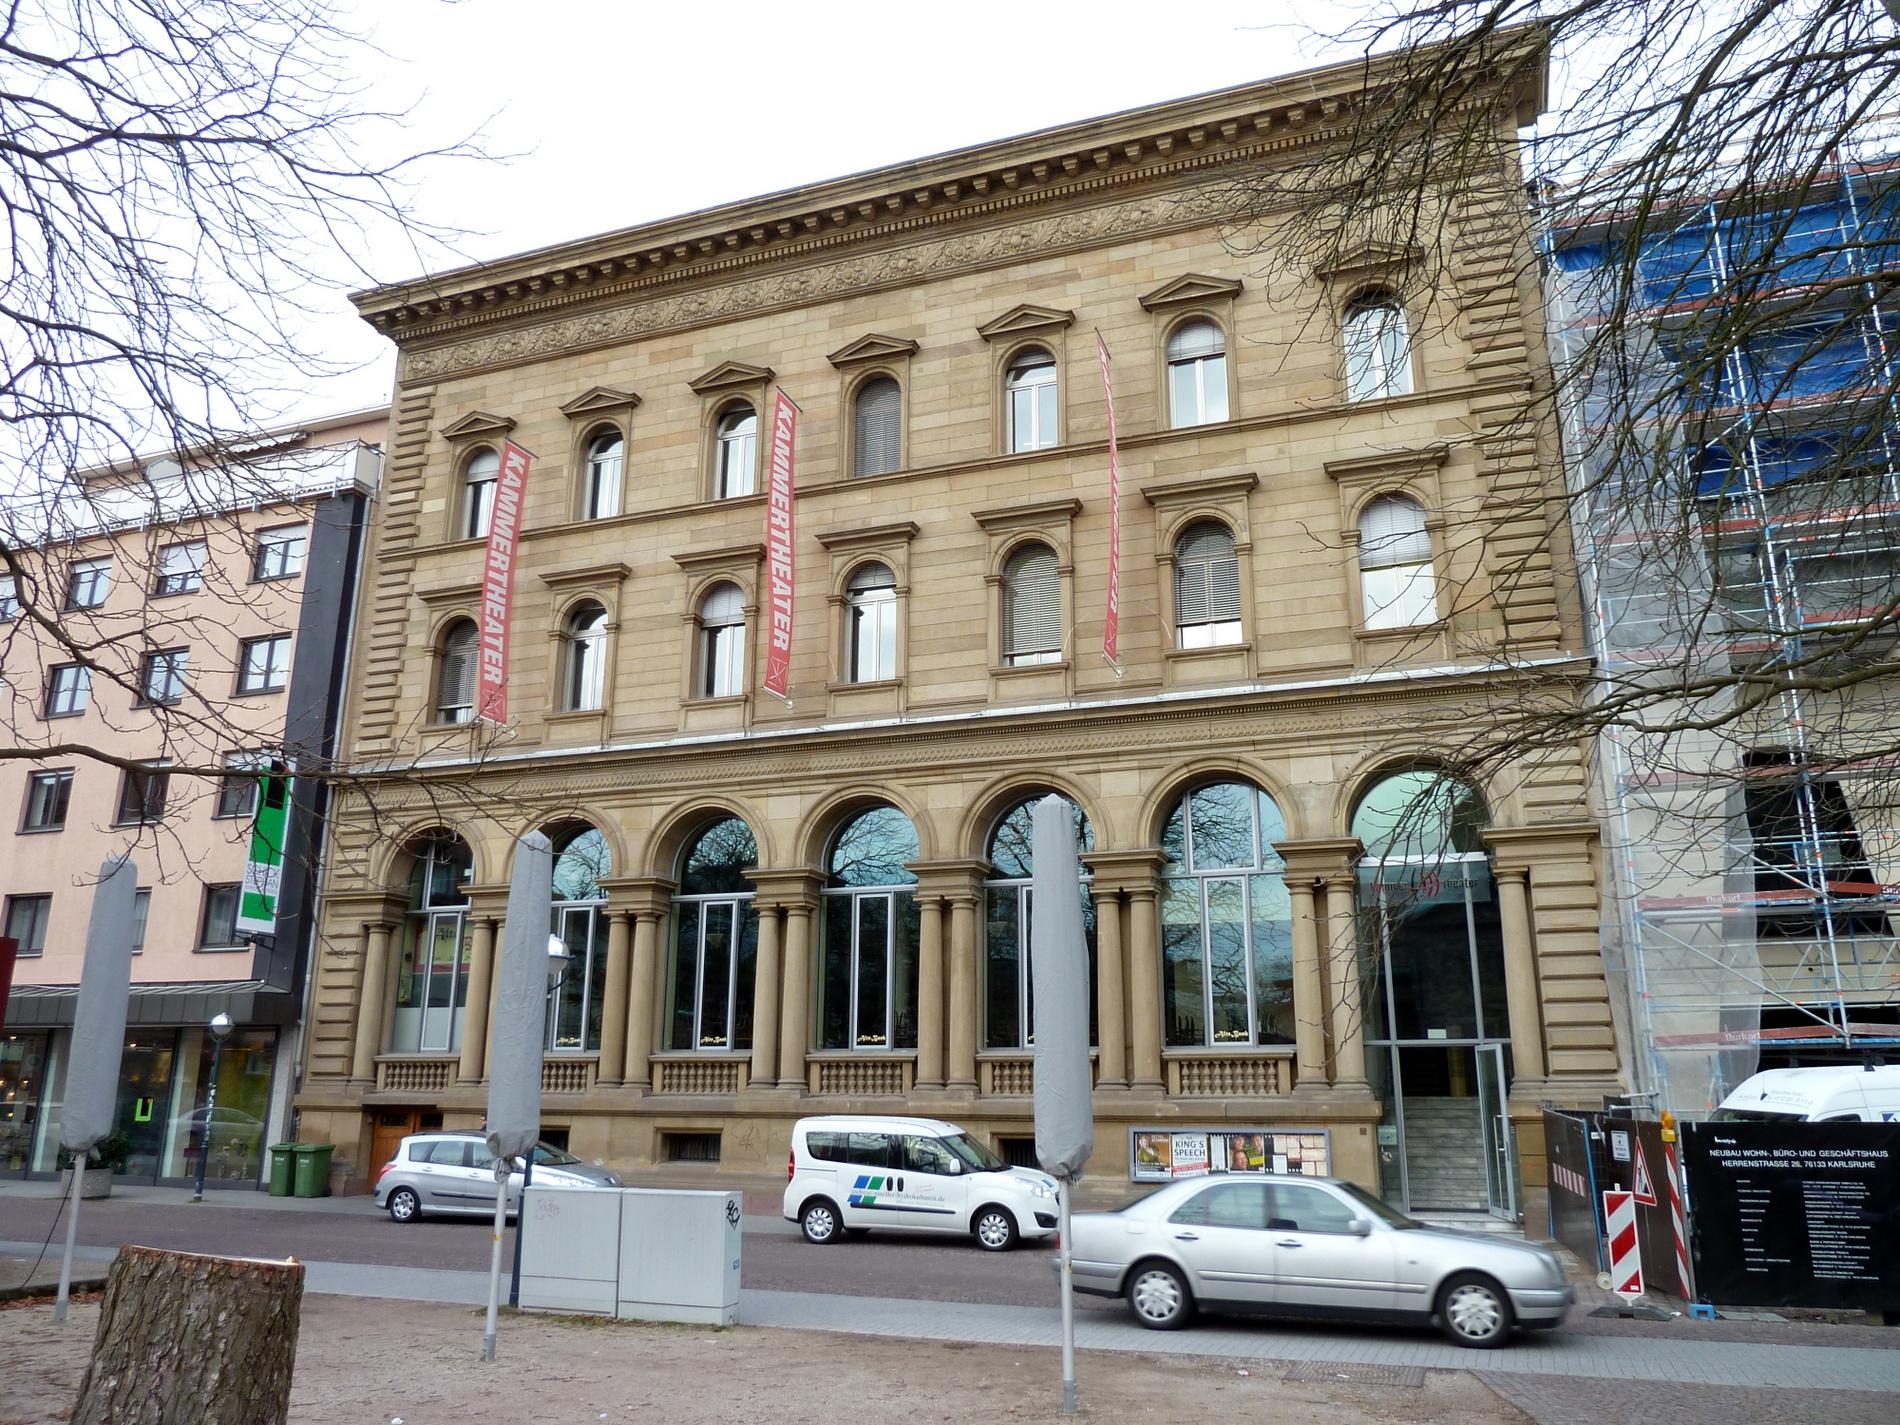 Baufirma Karlsruhe karlsruhe kulturdenkmal herrenstr 30 32 flst 1213